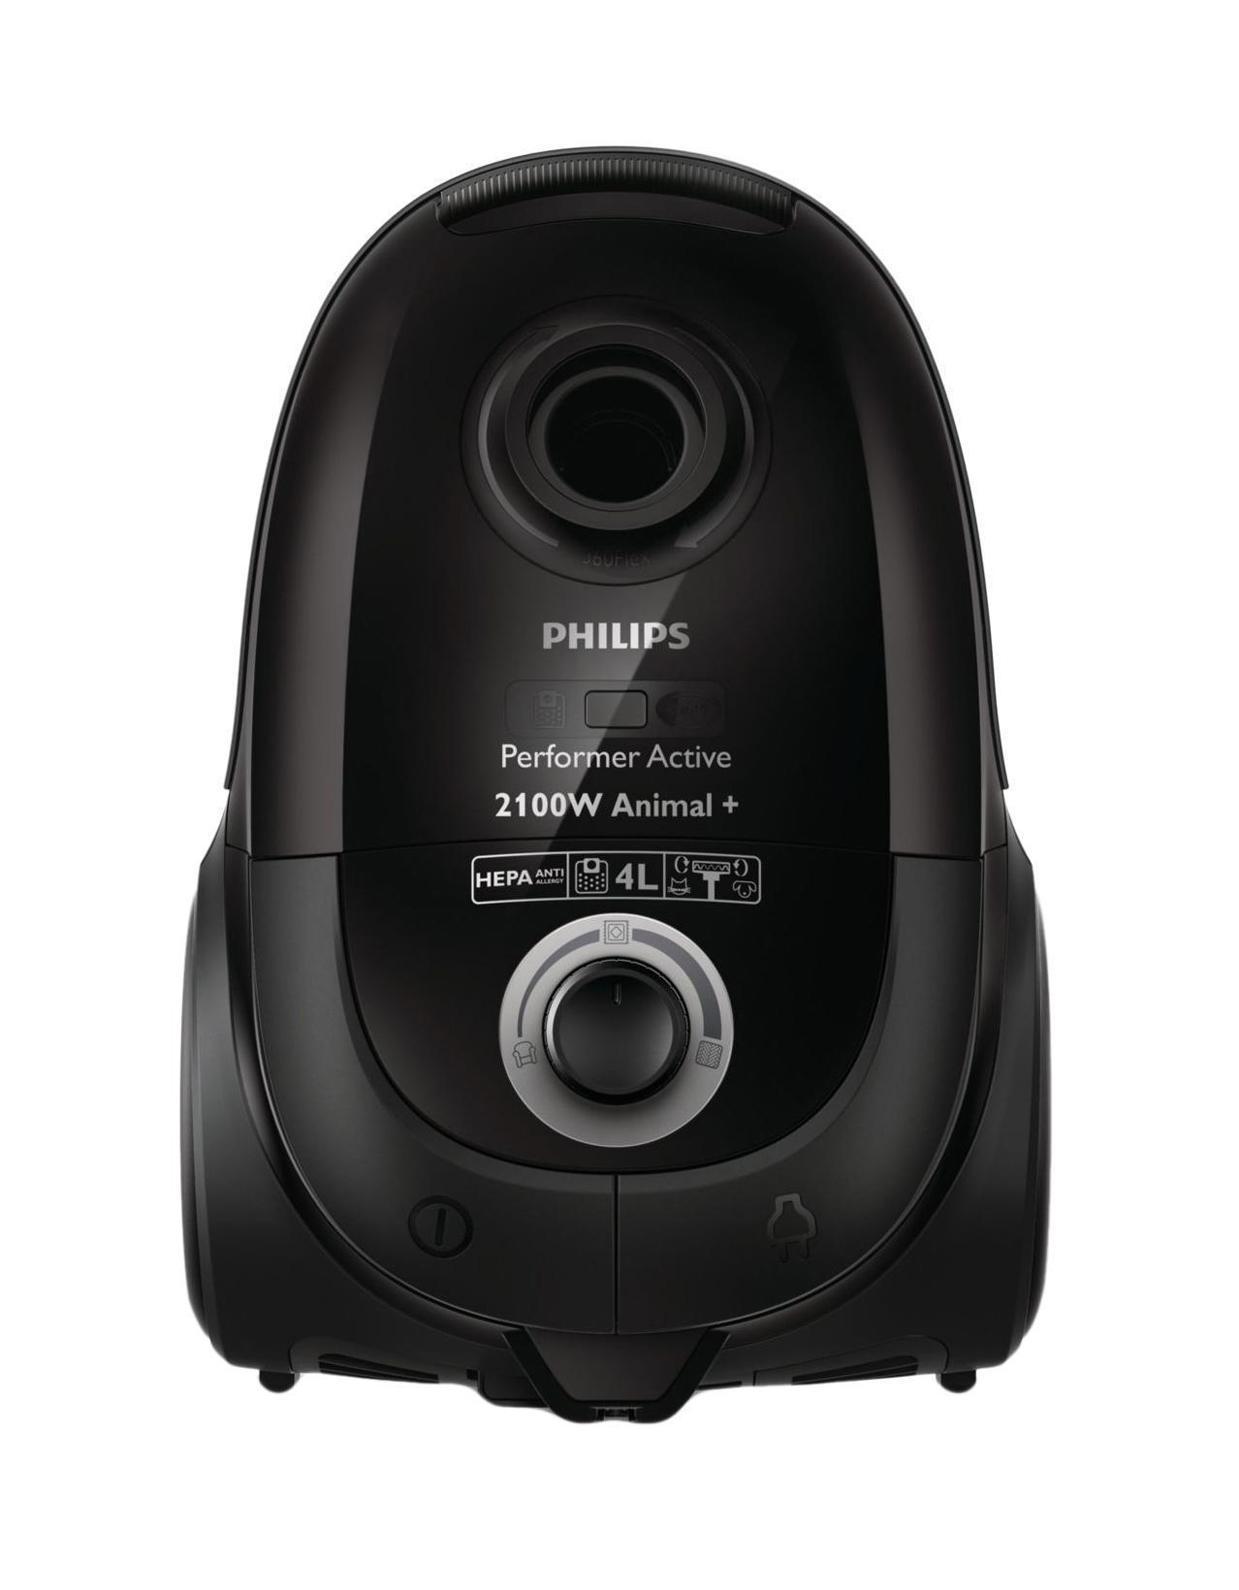 Philips FC8657/01 Performer, Black пылесос ( FC8657/01 )